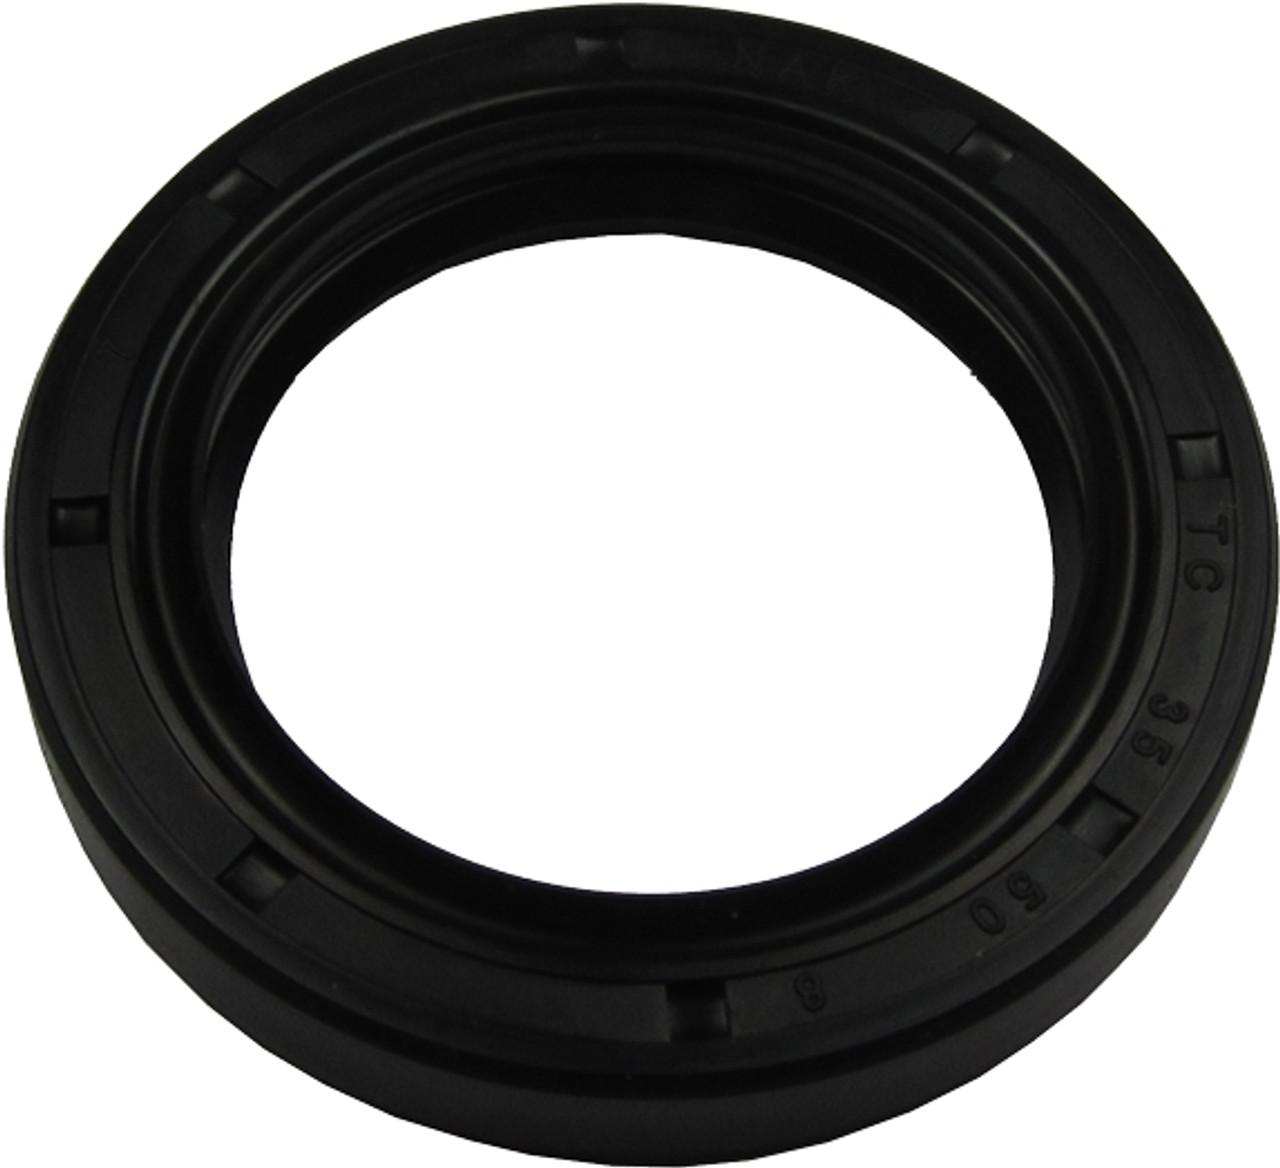 Yamaha G16 Cylinder Head: Yamaha Fan Side Crankshaft Seal For G2, G8, G9, G11, G14